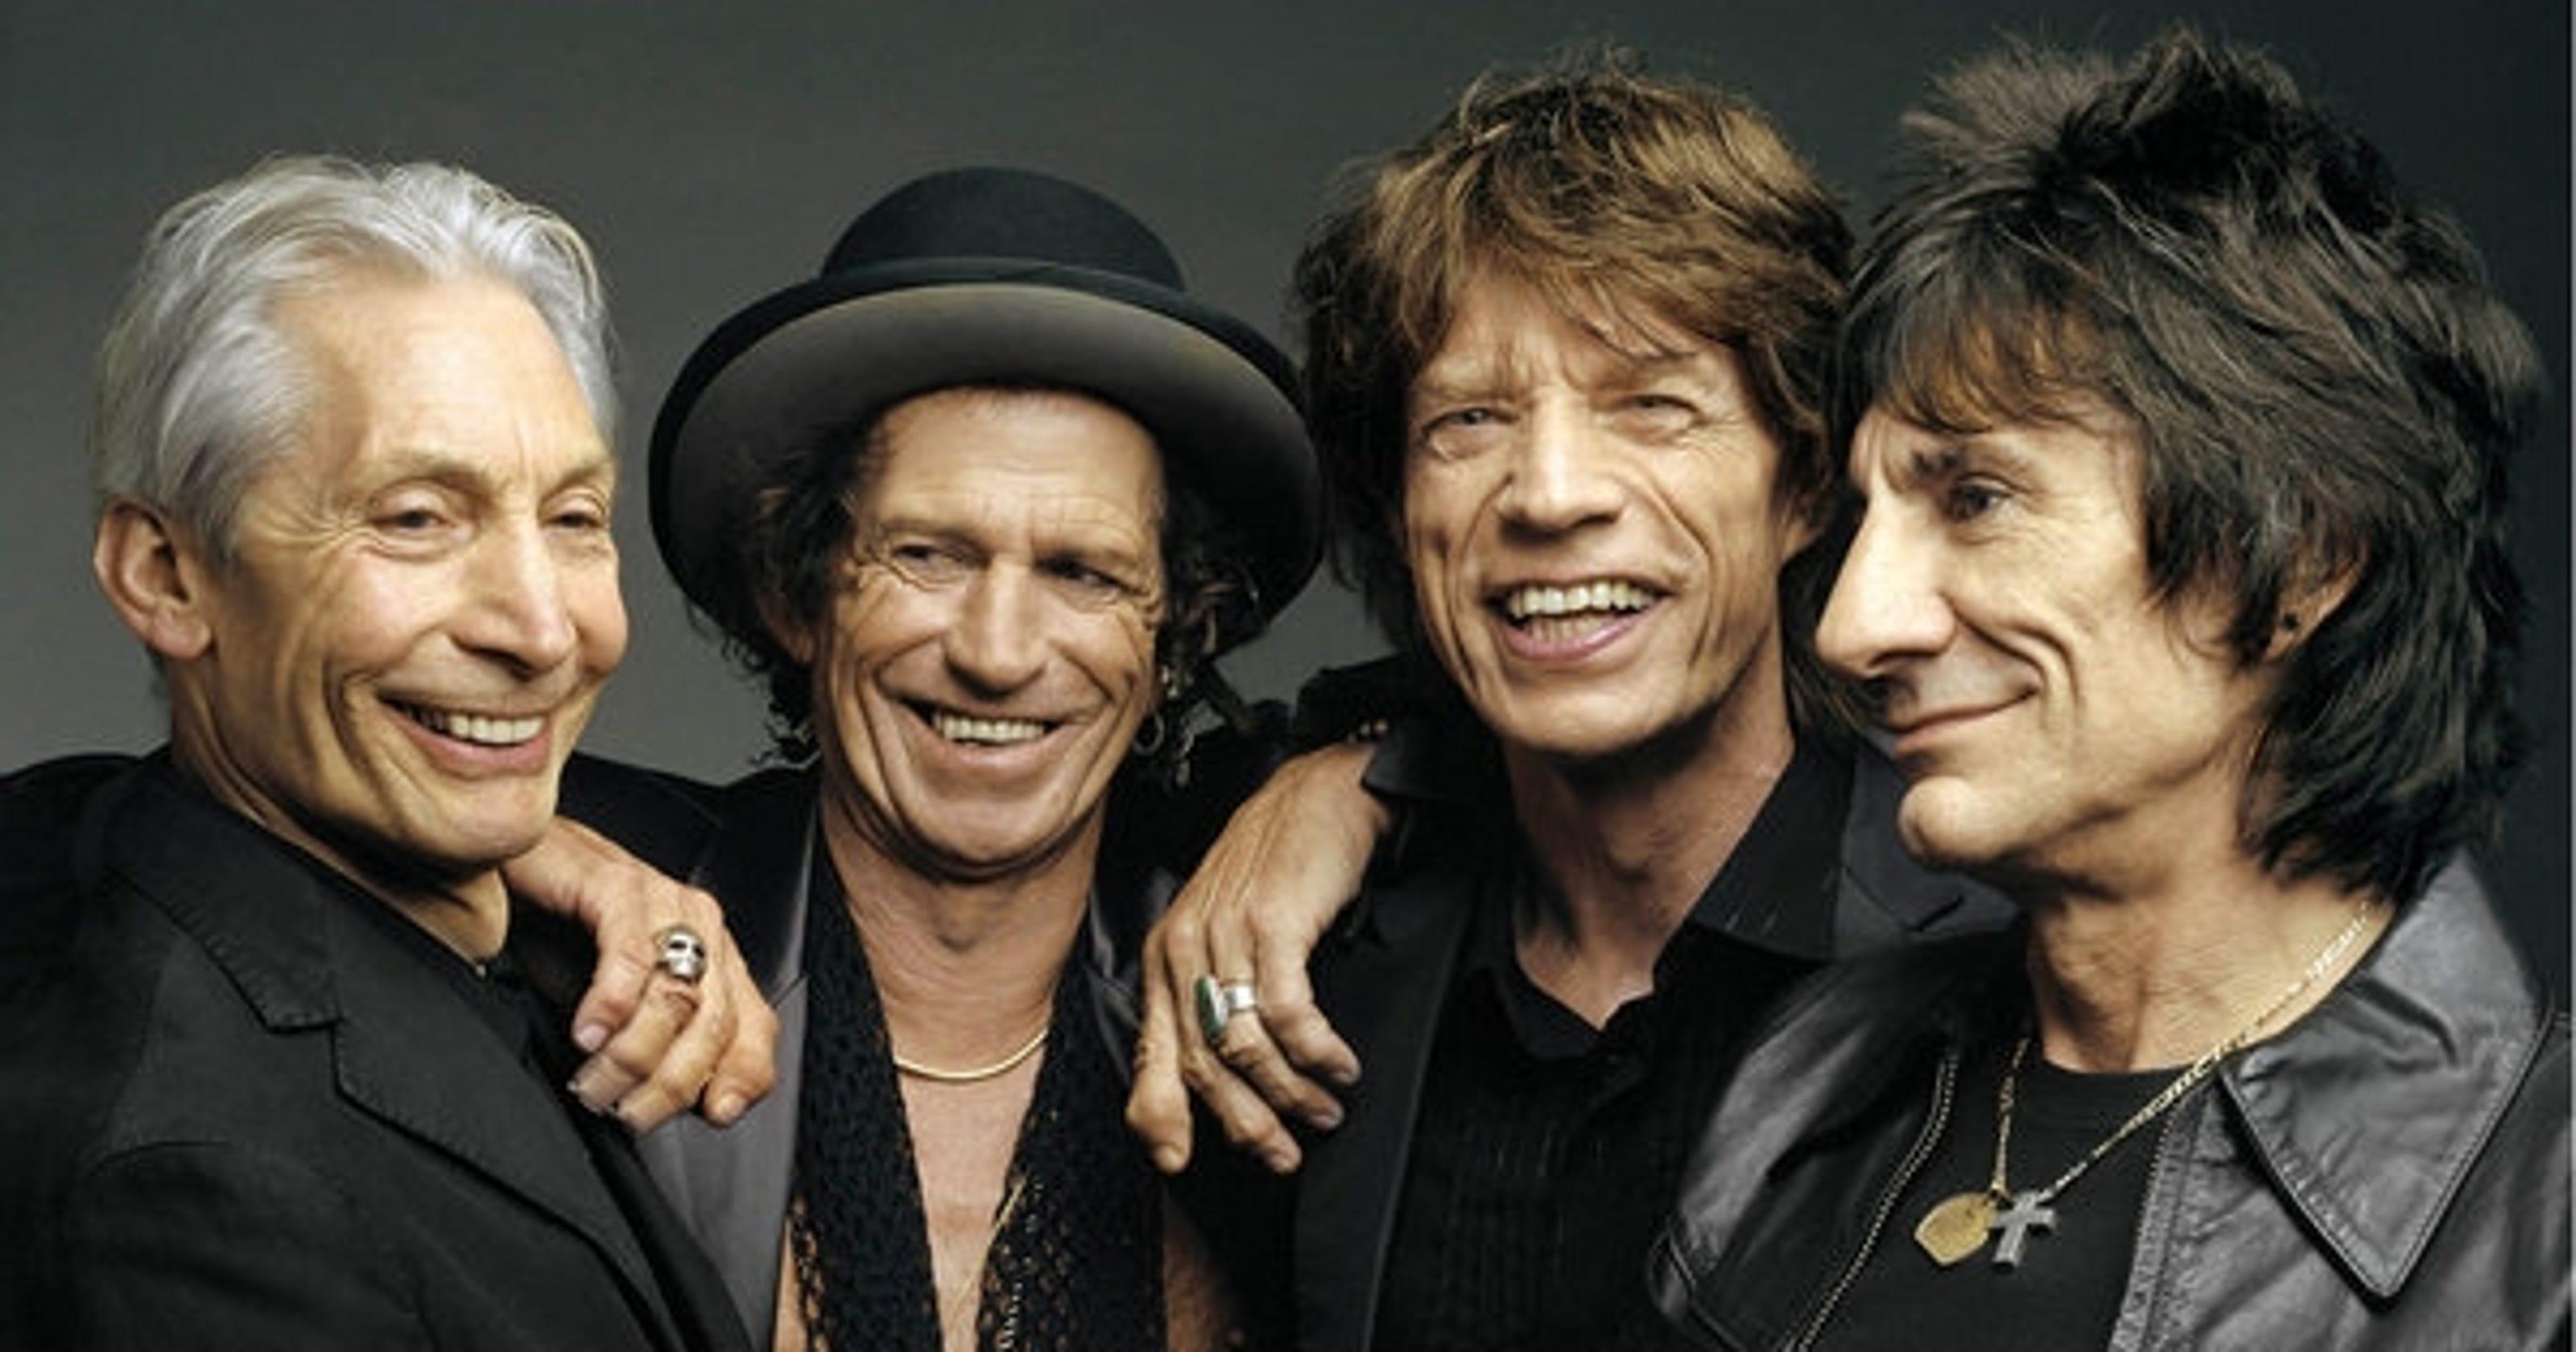 Mick Jagger, Keith Richards: Stones 'raring to go'